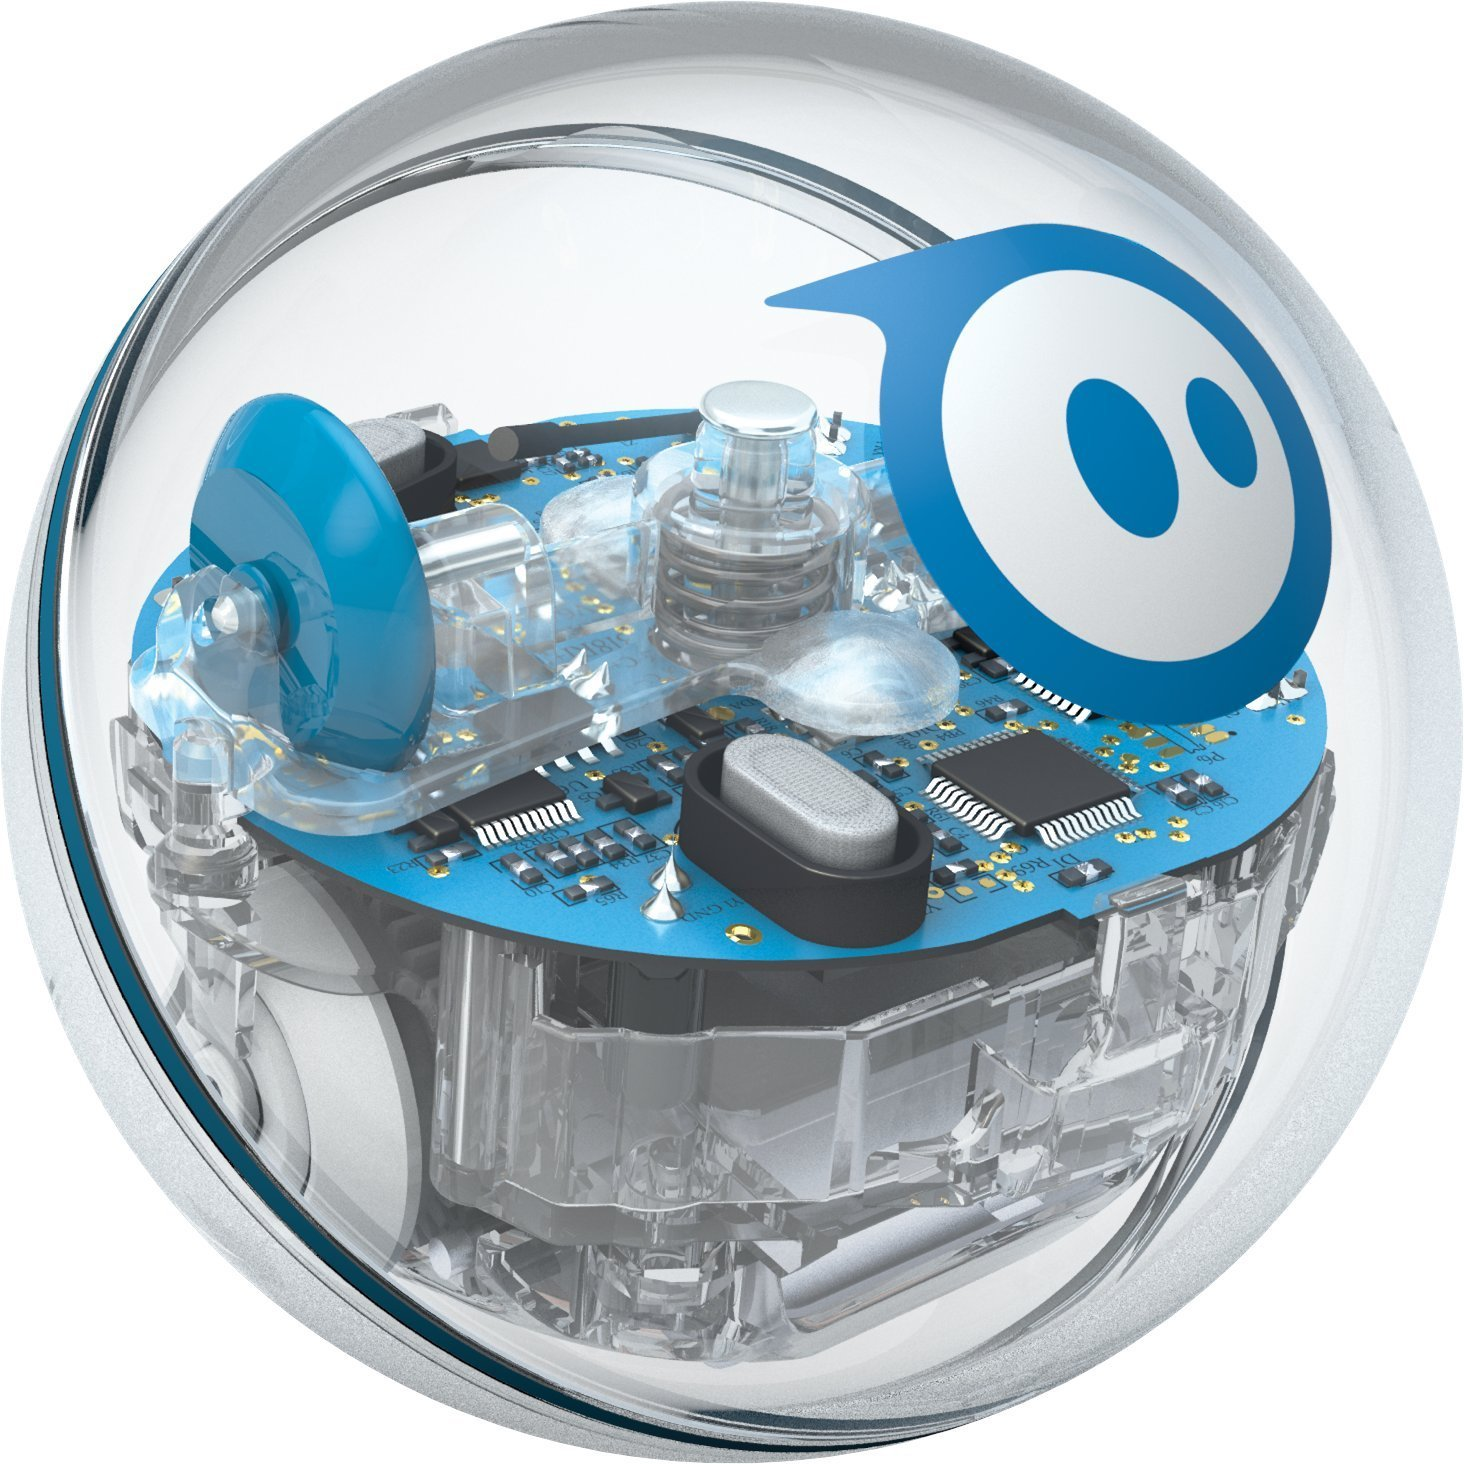 Sphero Educational Robot